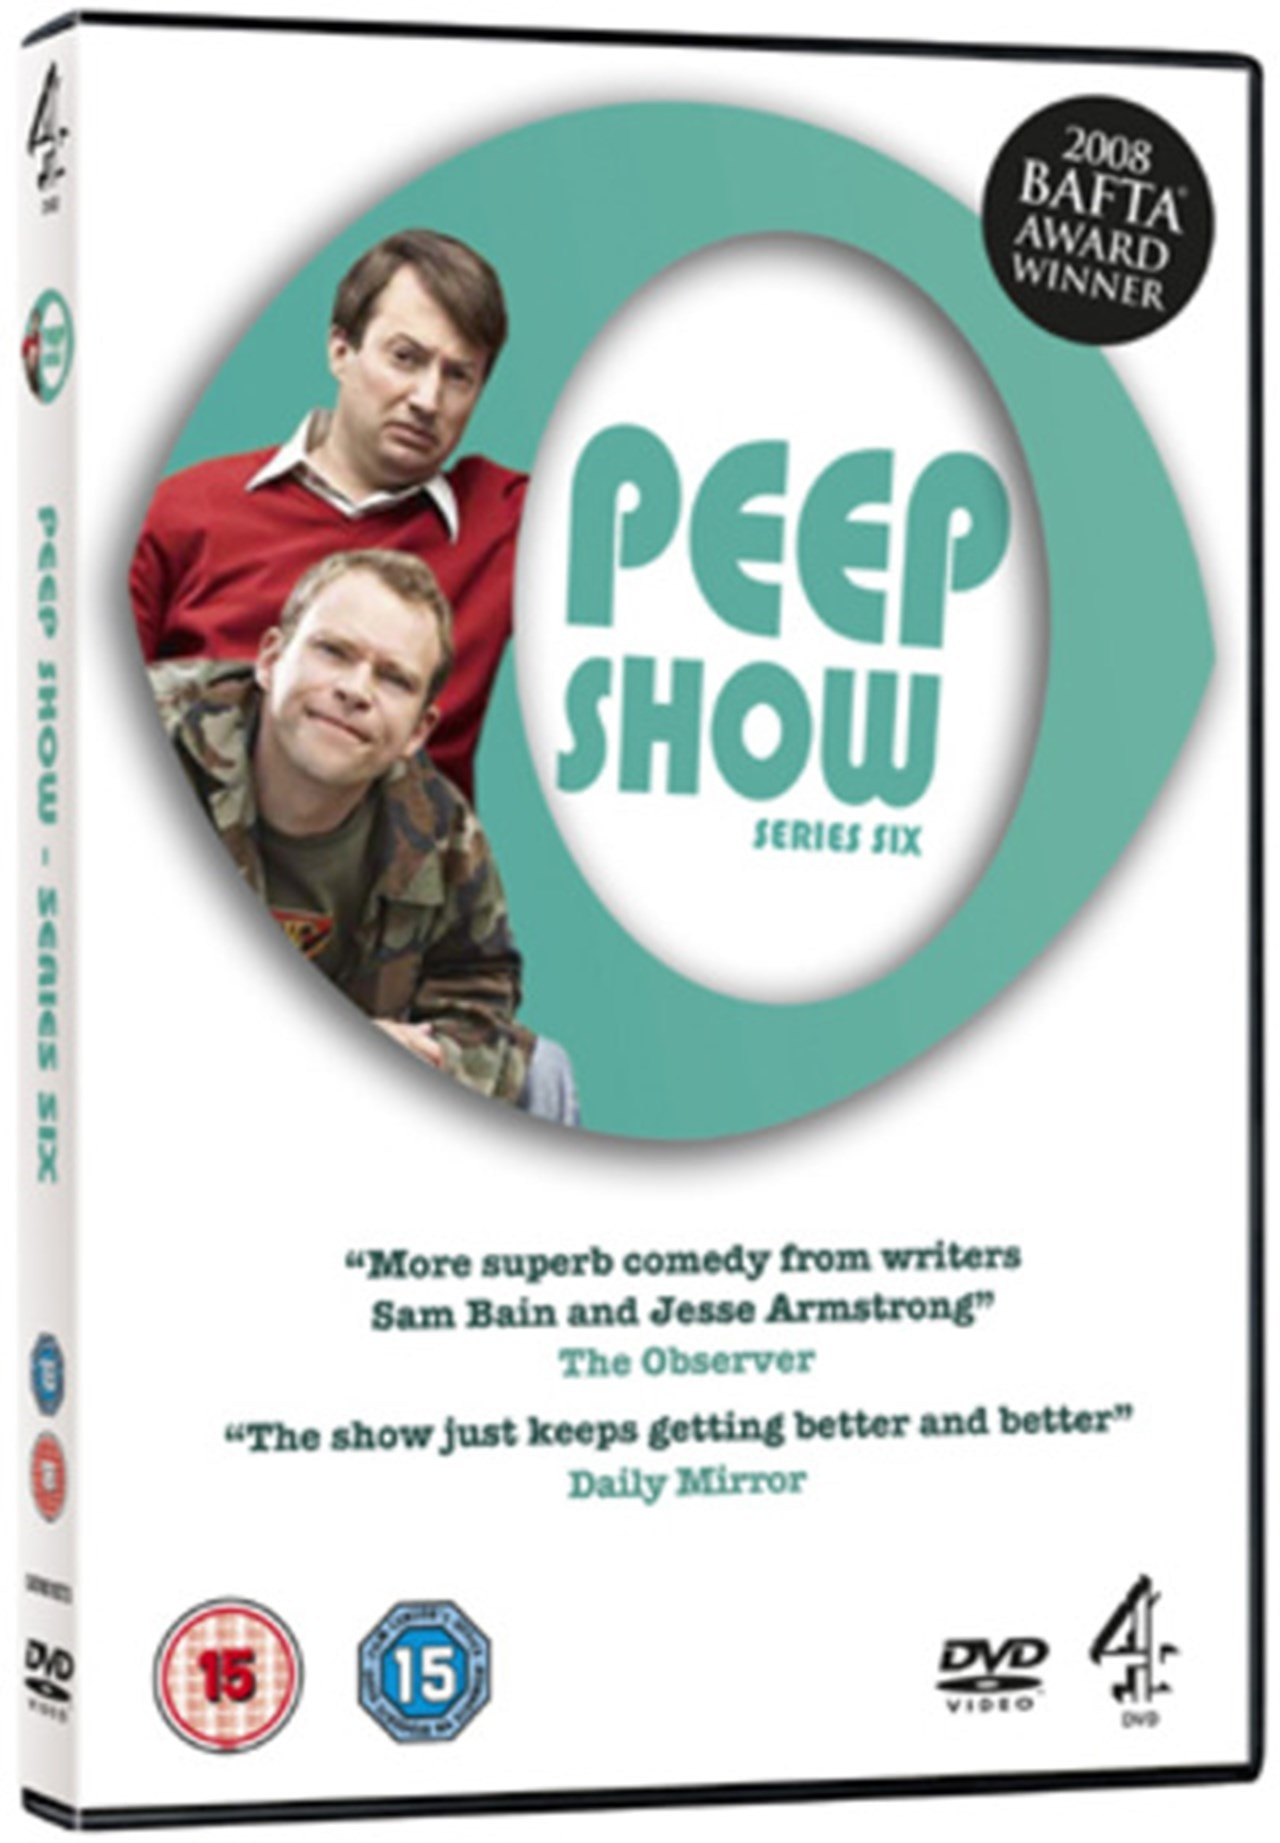 Peep Show: Series 6 - 1